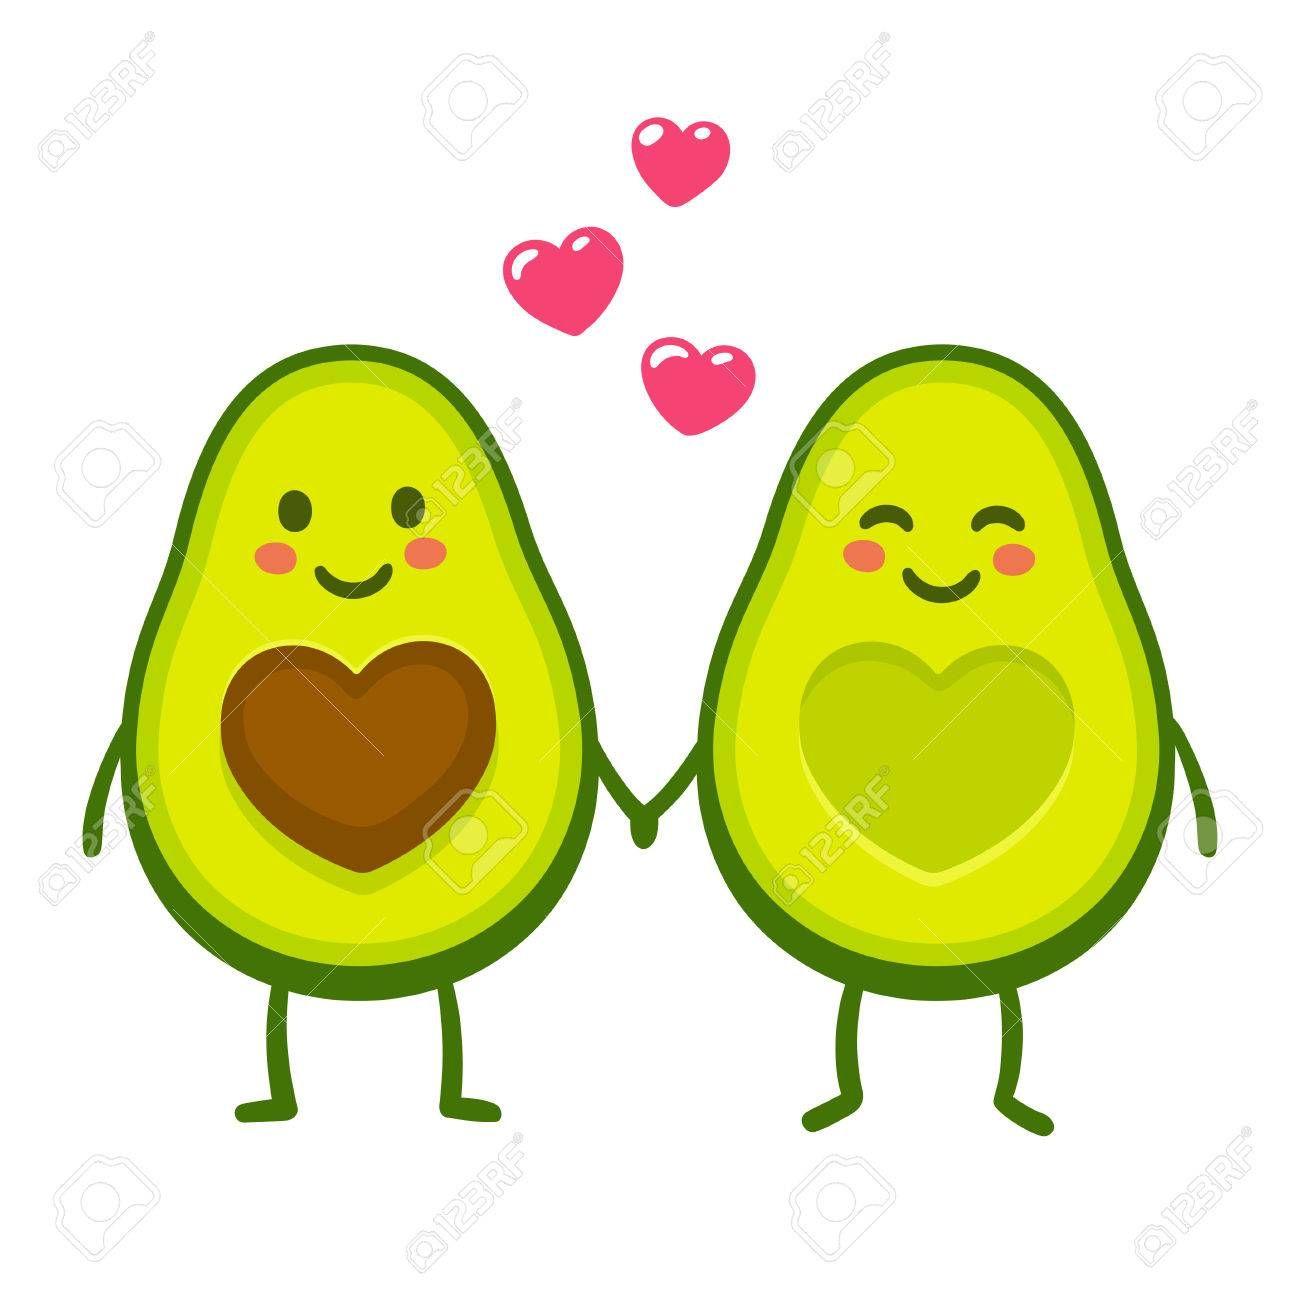 Funny Avocado Clipart Cute Disney Drawings Avocado Cartoon Cute Avocado